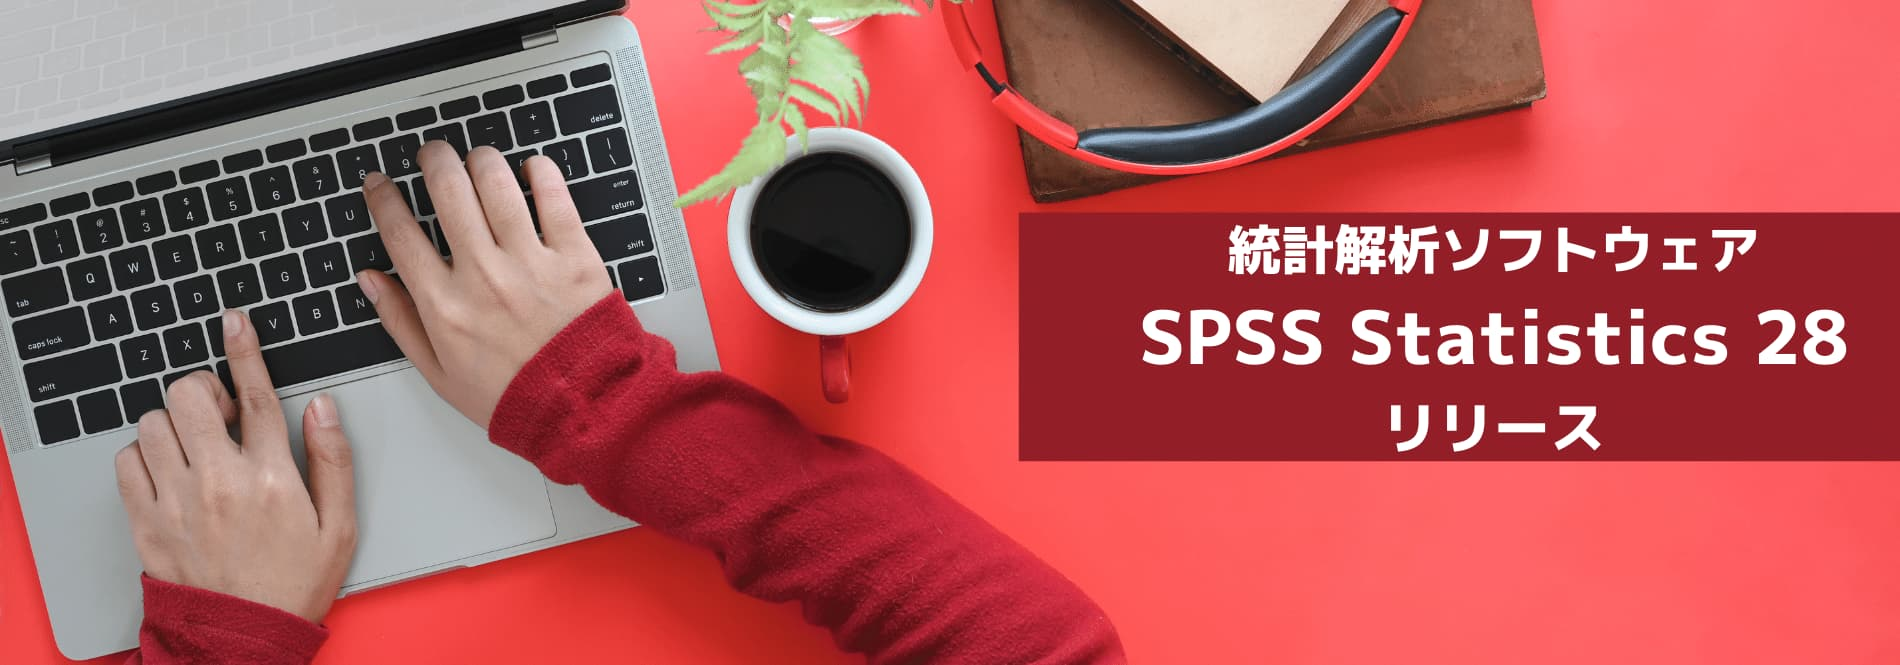 SPSS Statistics 28リリース